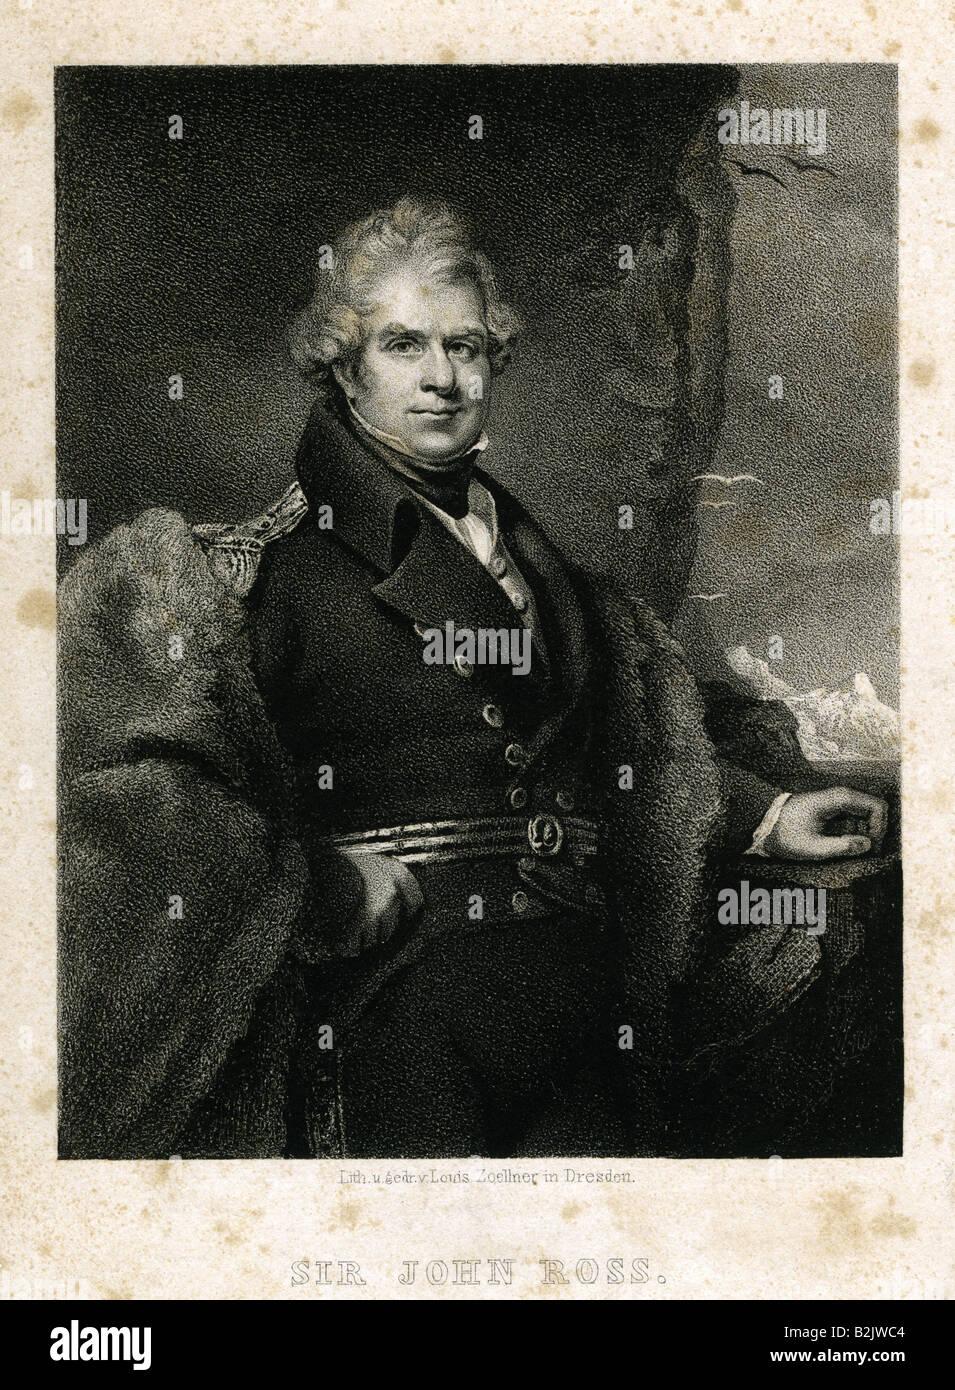 Ross, Sir John, 24.6.1777 - 30.8.1856, British rear admiral, Arctic explorer, half length, lithograph, by Louis - Stock Image